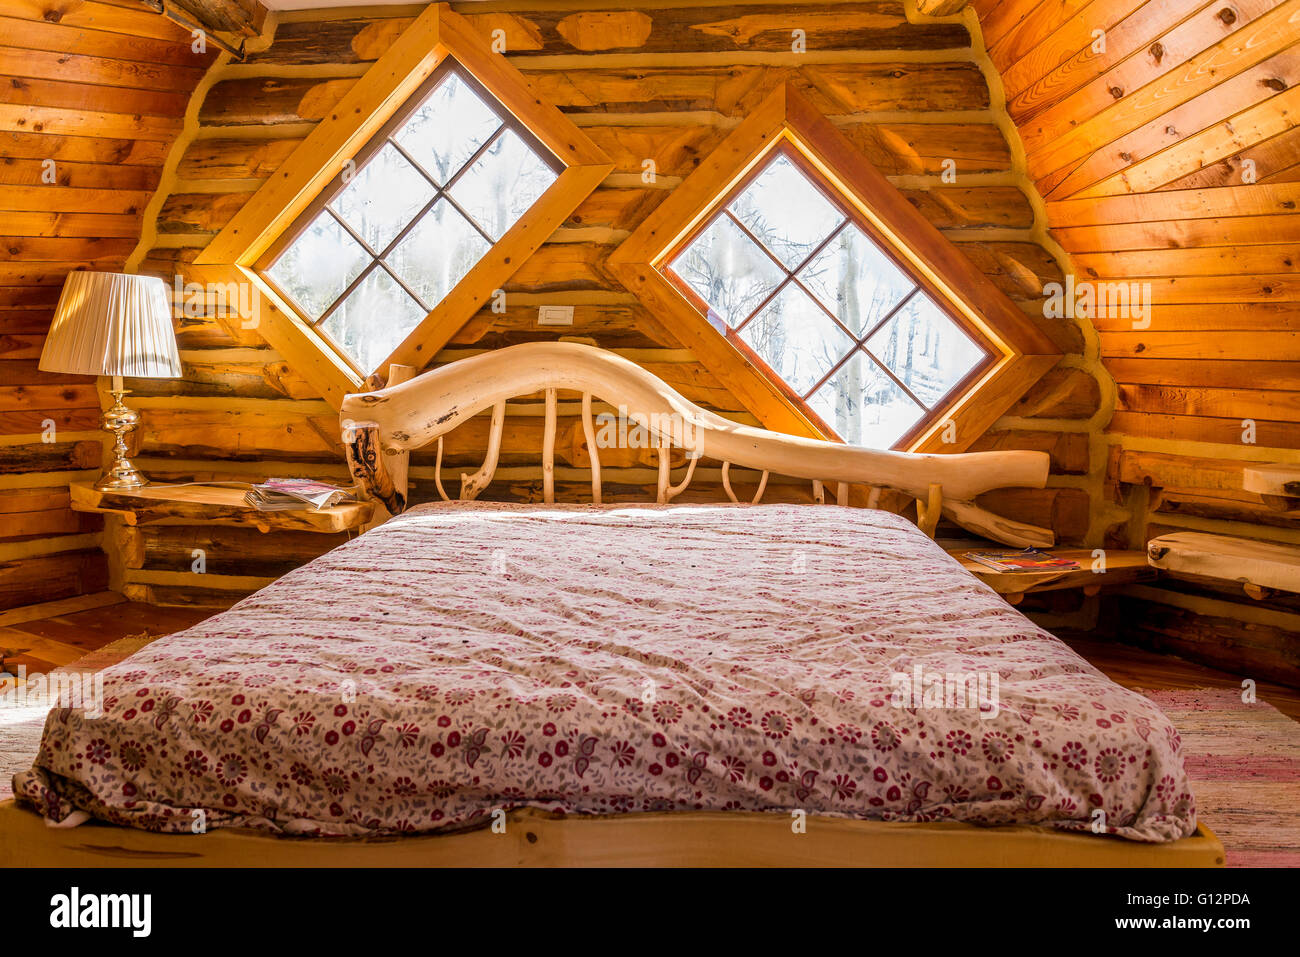 Handmade bed in funky log cabin - Stock Image